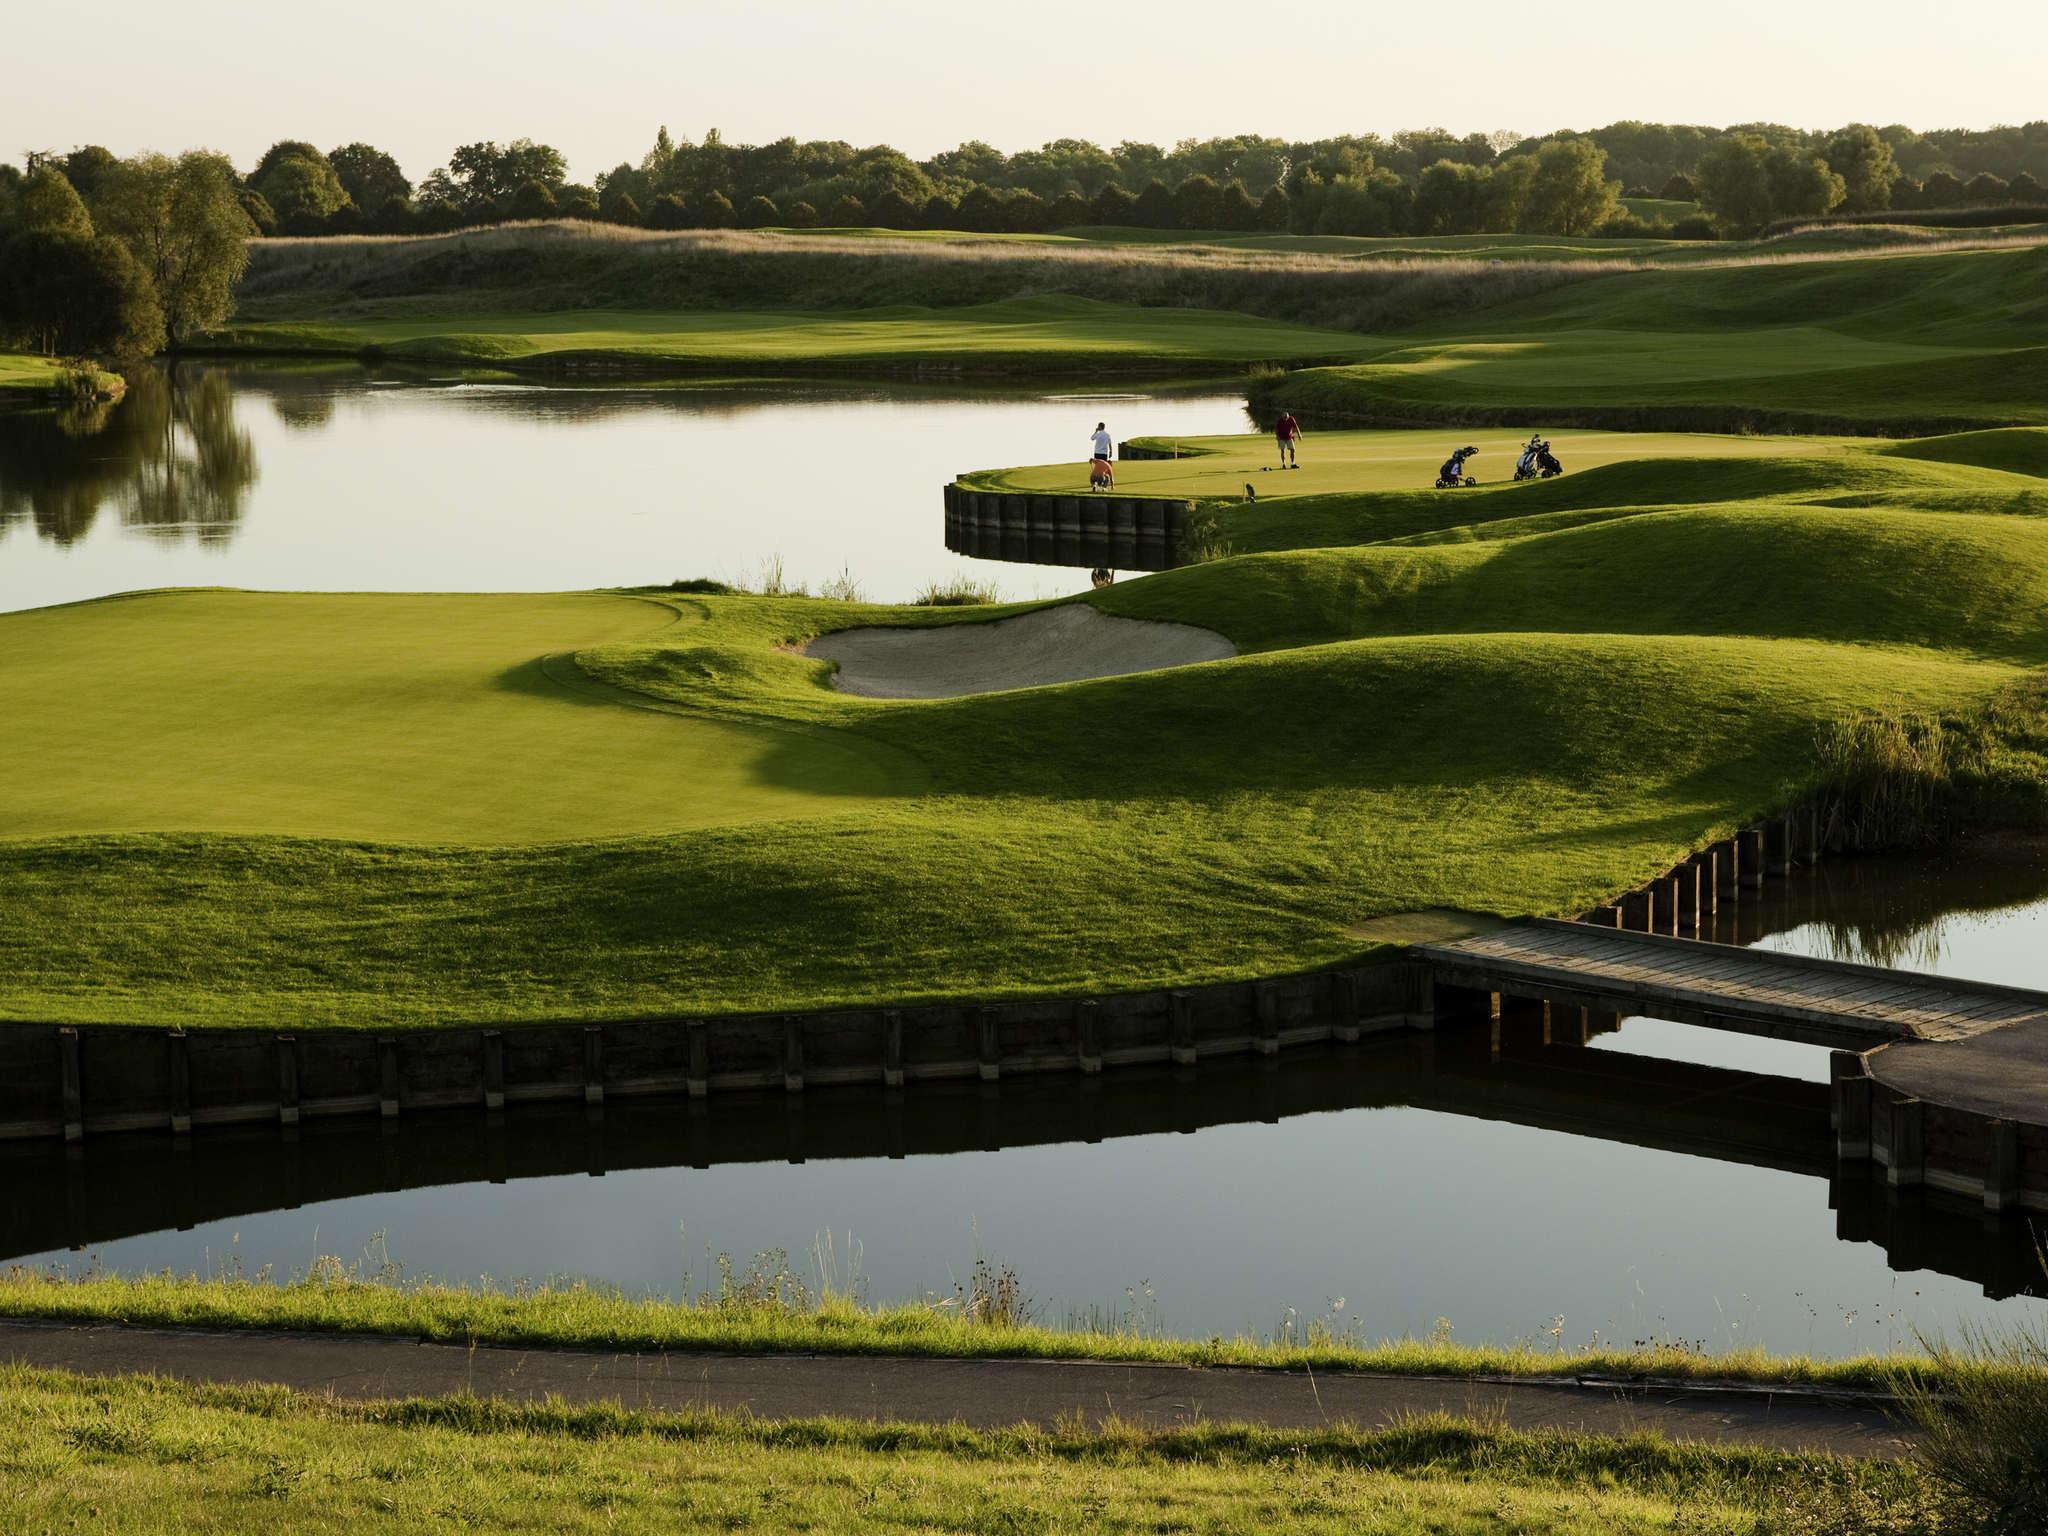 Hotel – Novotel Saint-Quentin Golf National